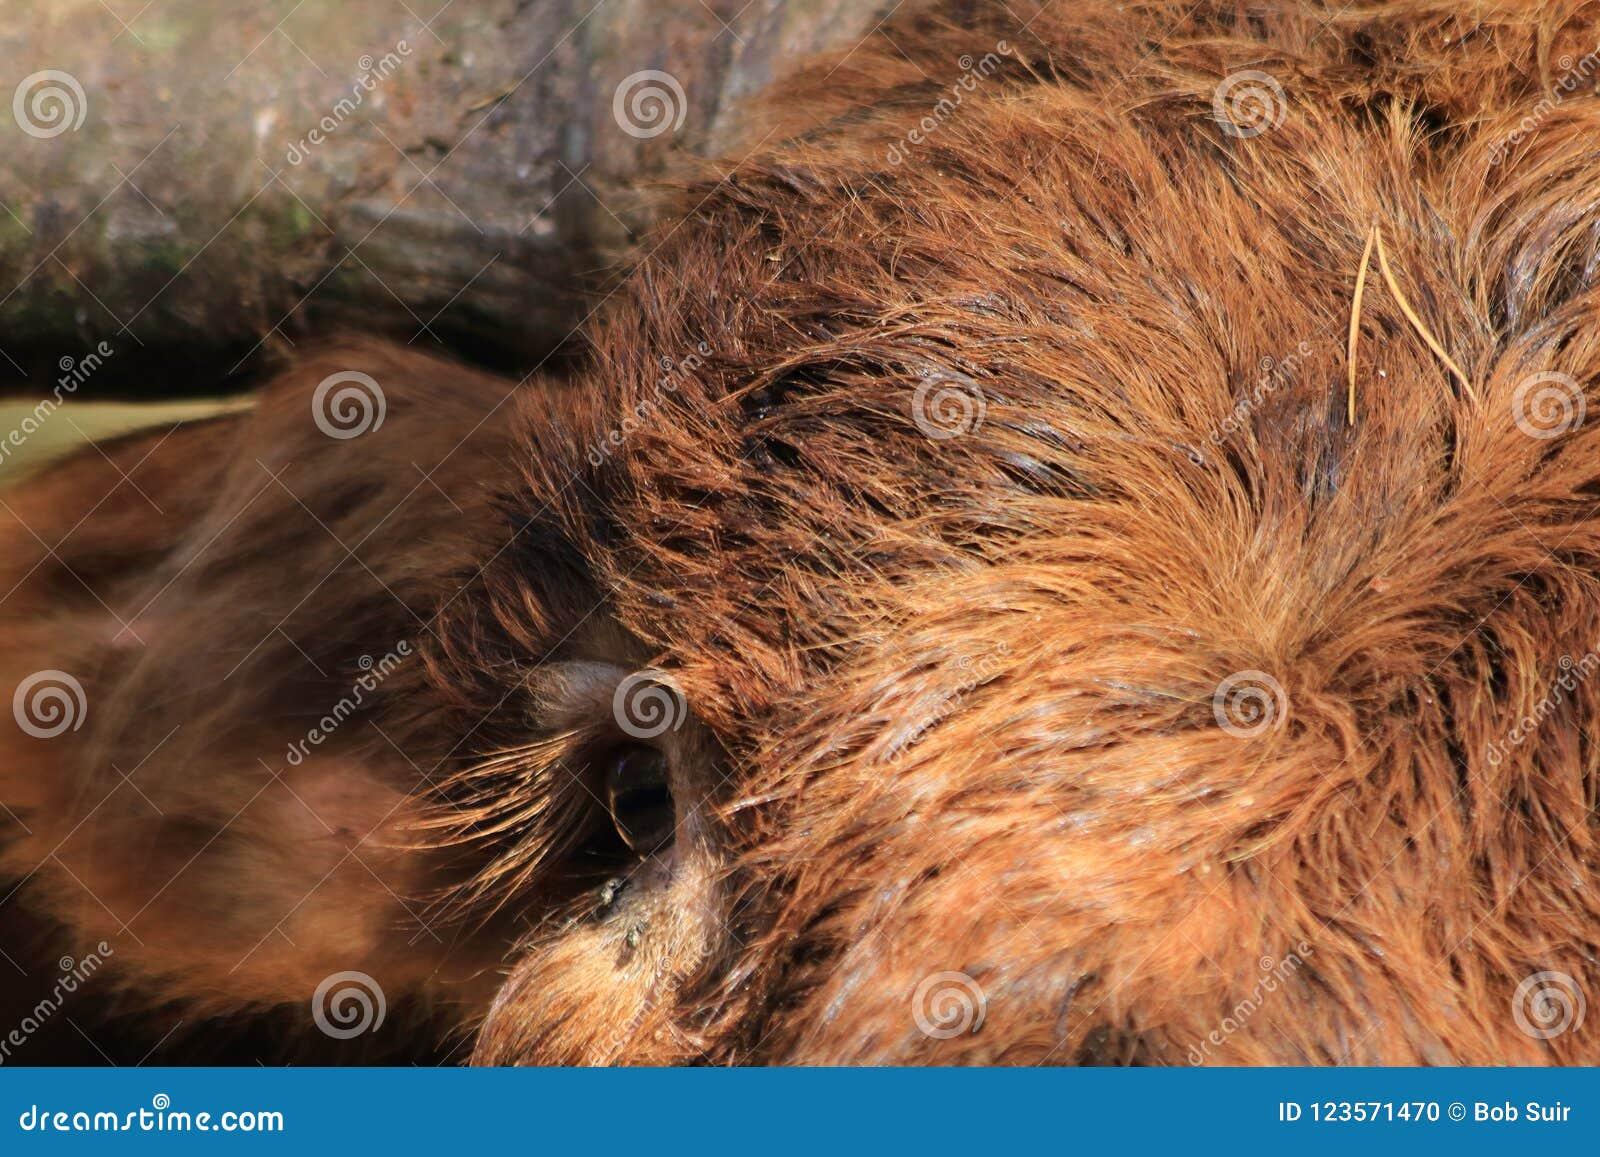 Close Up Highland Cow Eye Stock Photo Image Of Horns 123571470